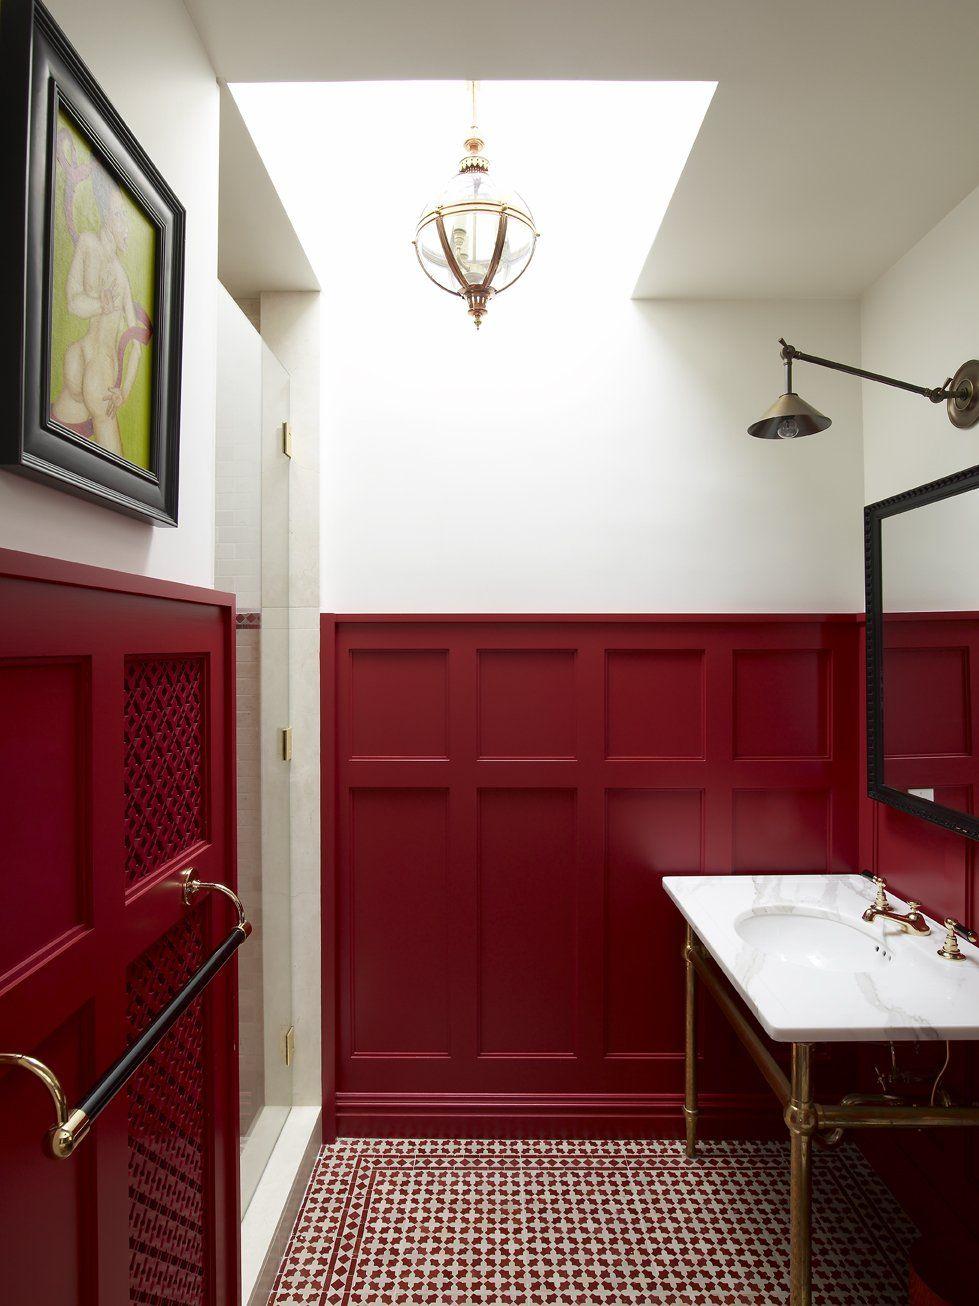 Bathroom interior wall wall paneling  bathroom design  pinterest  batten walls and board